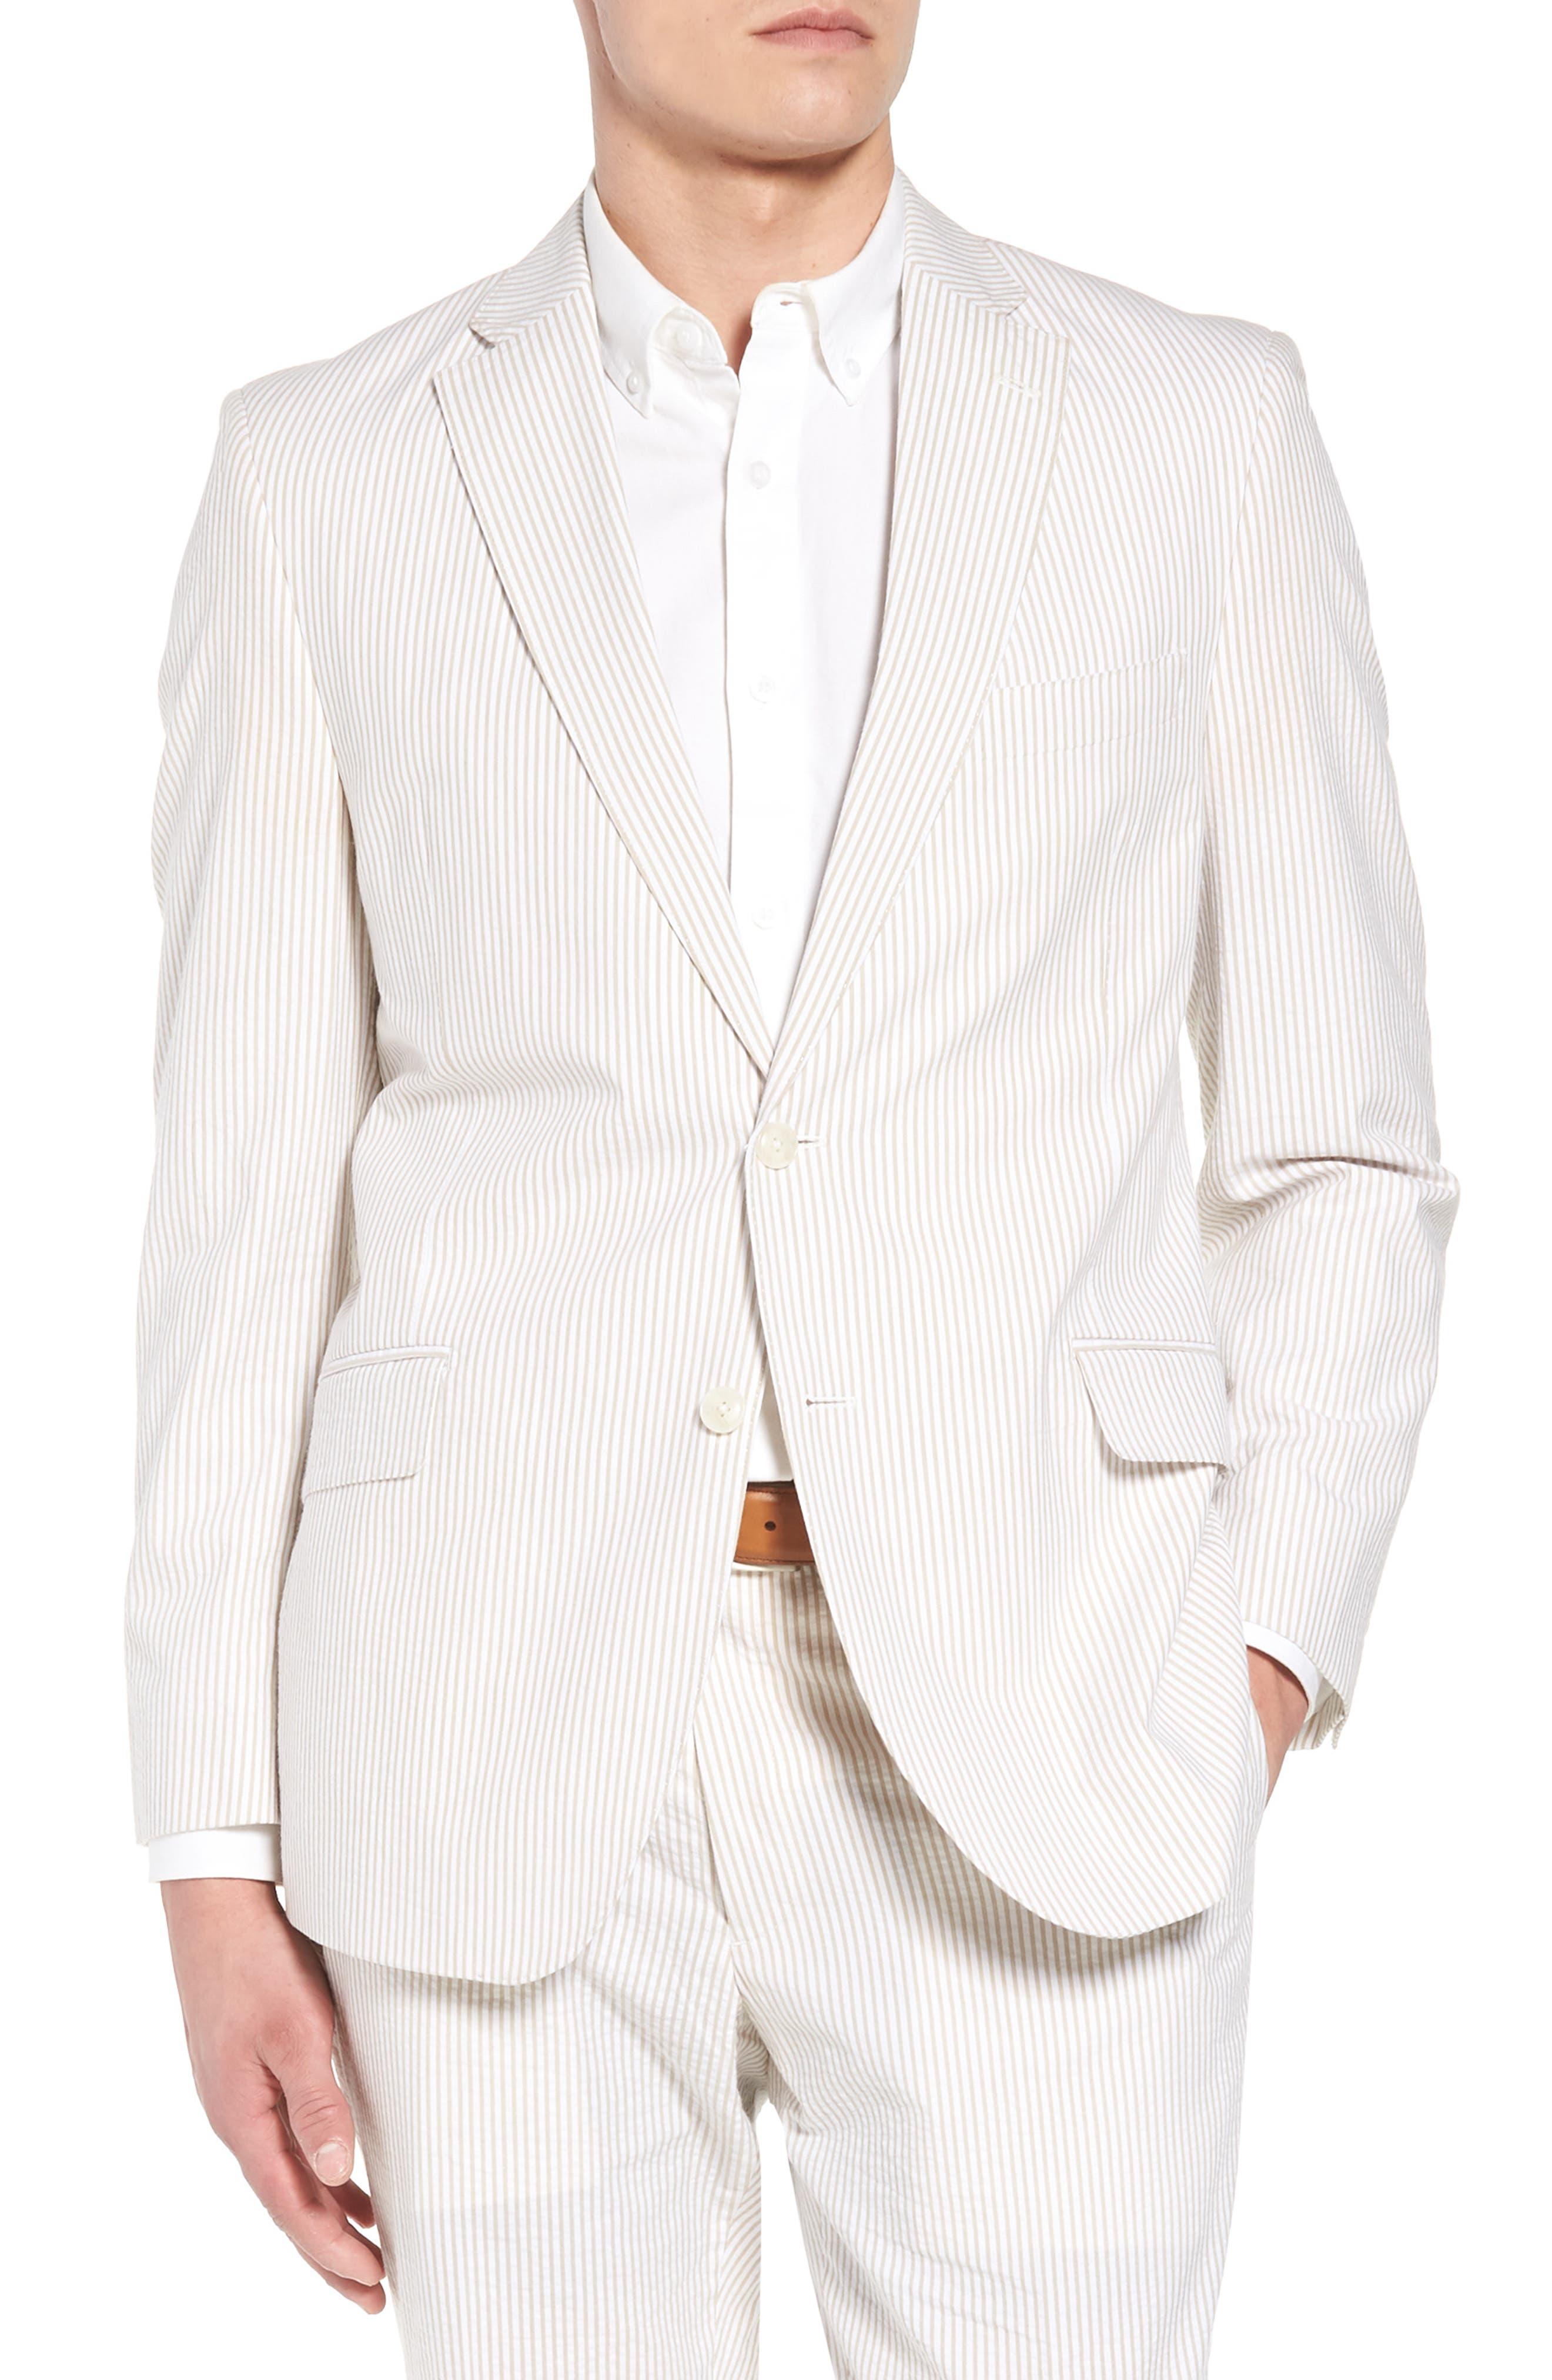 Jack AIM Classic Fit Seersucker Sport Coat,                         Main,                         color, Tan And White